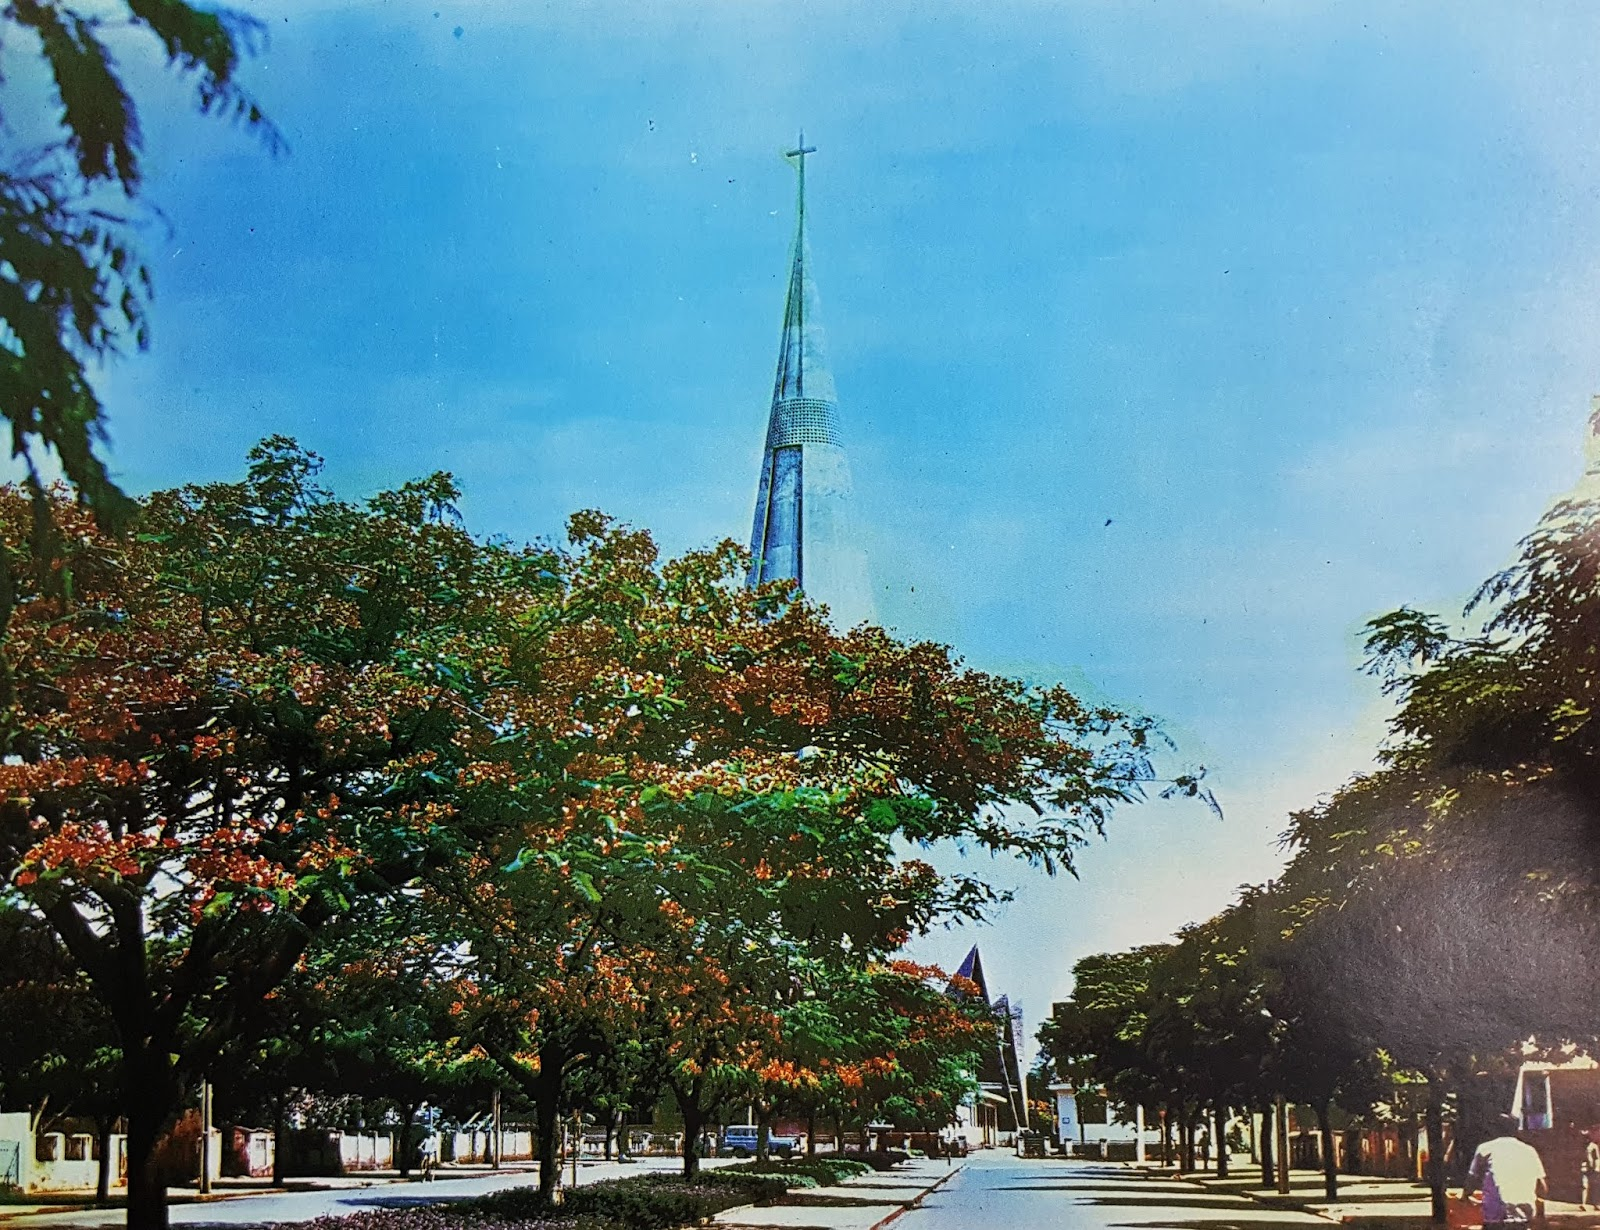 Avenida Cerro - 1972